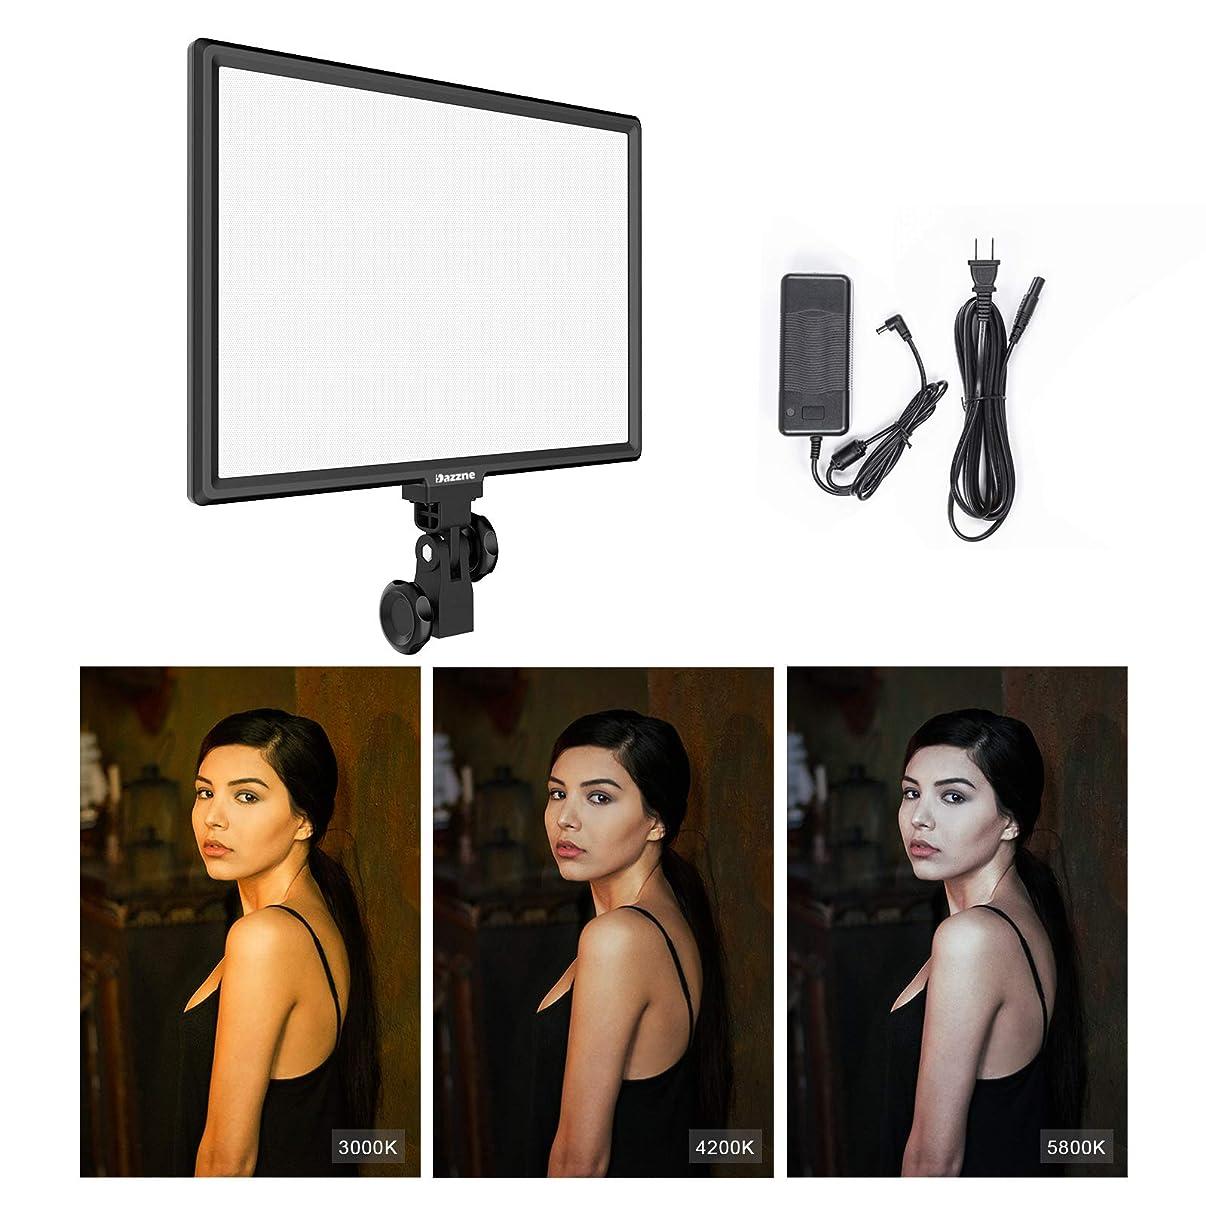 15.4inch Large LED Panel Light Photography 3000K-5800K 45W 4800LM Dimmable Bi-Color Soft Light for YouTube Video Shooting Studio Wedding Film Portrait Lighting